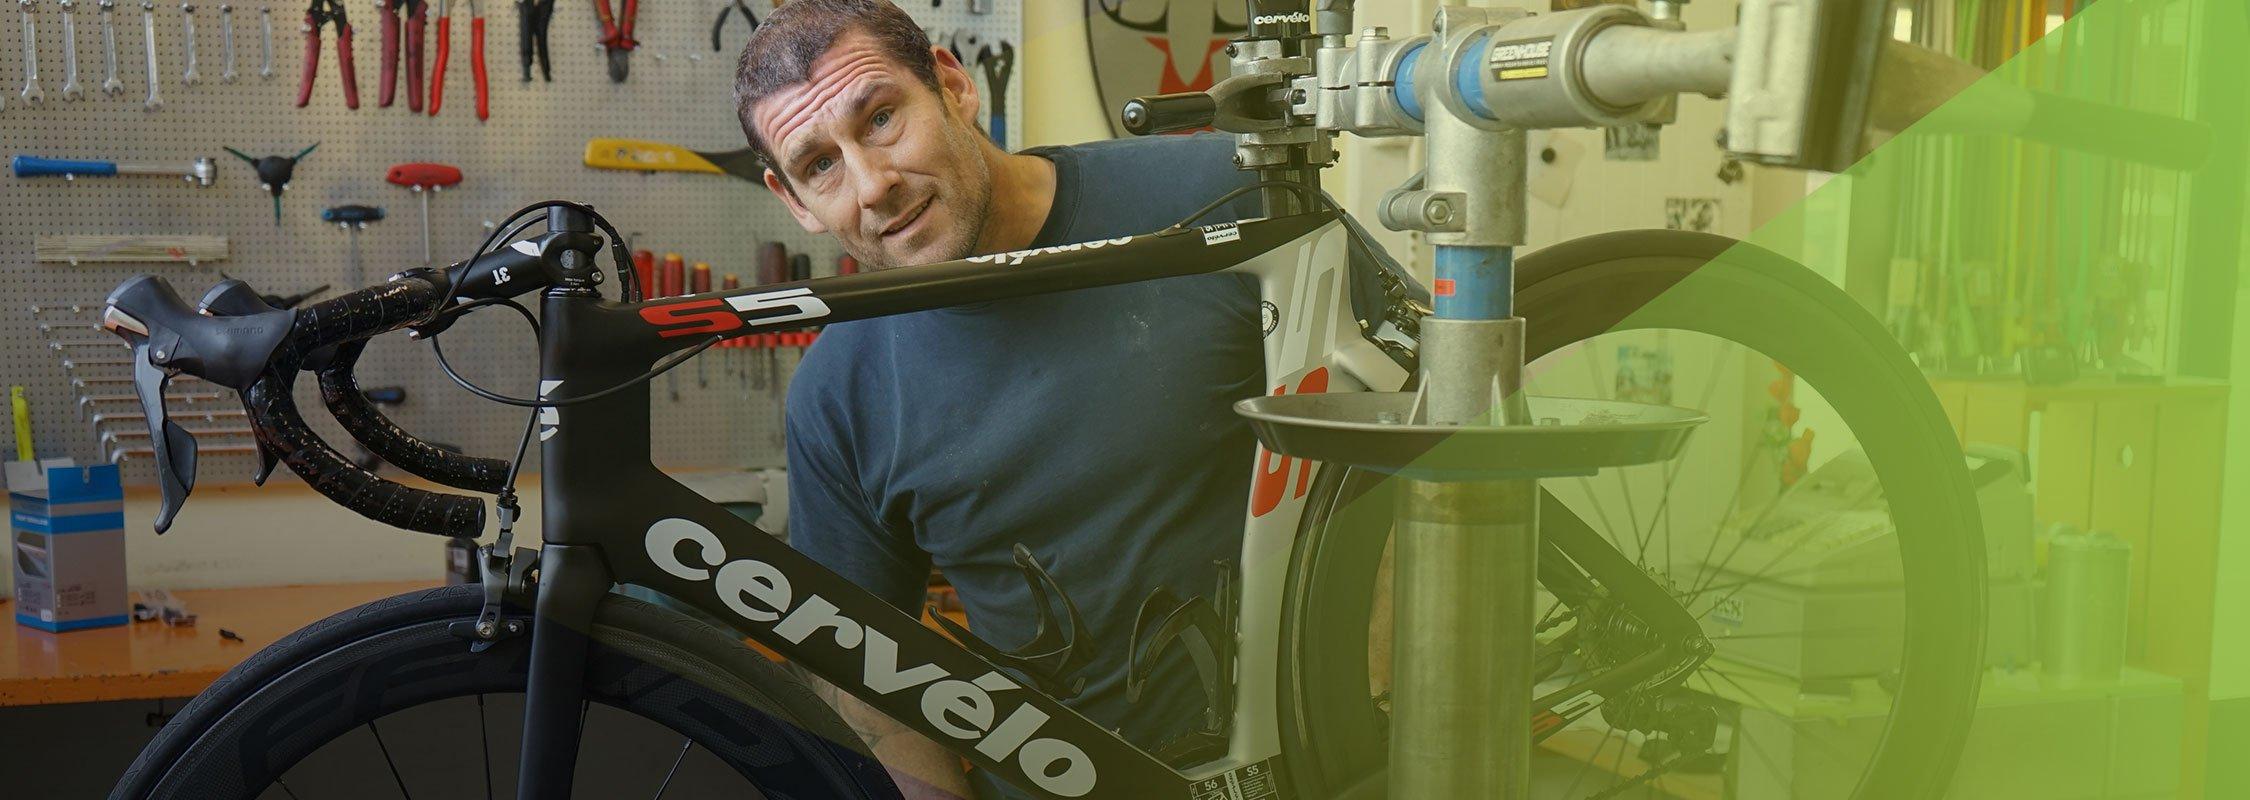 Fahrradverkauf und Fahrrad Reparaturen